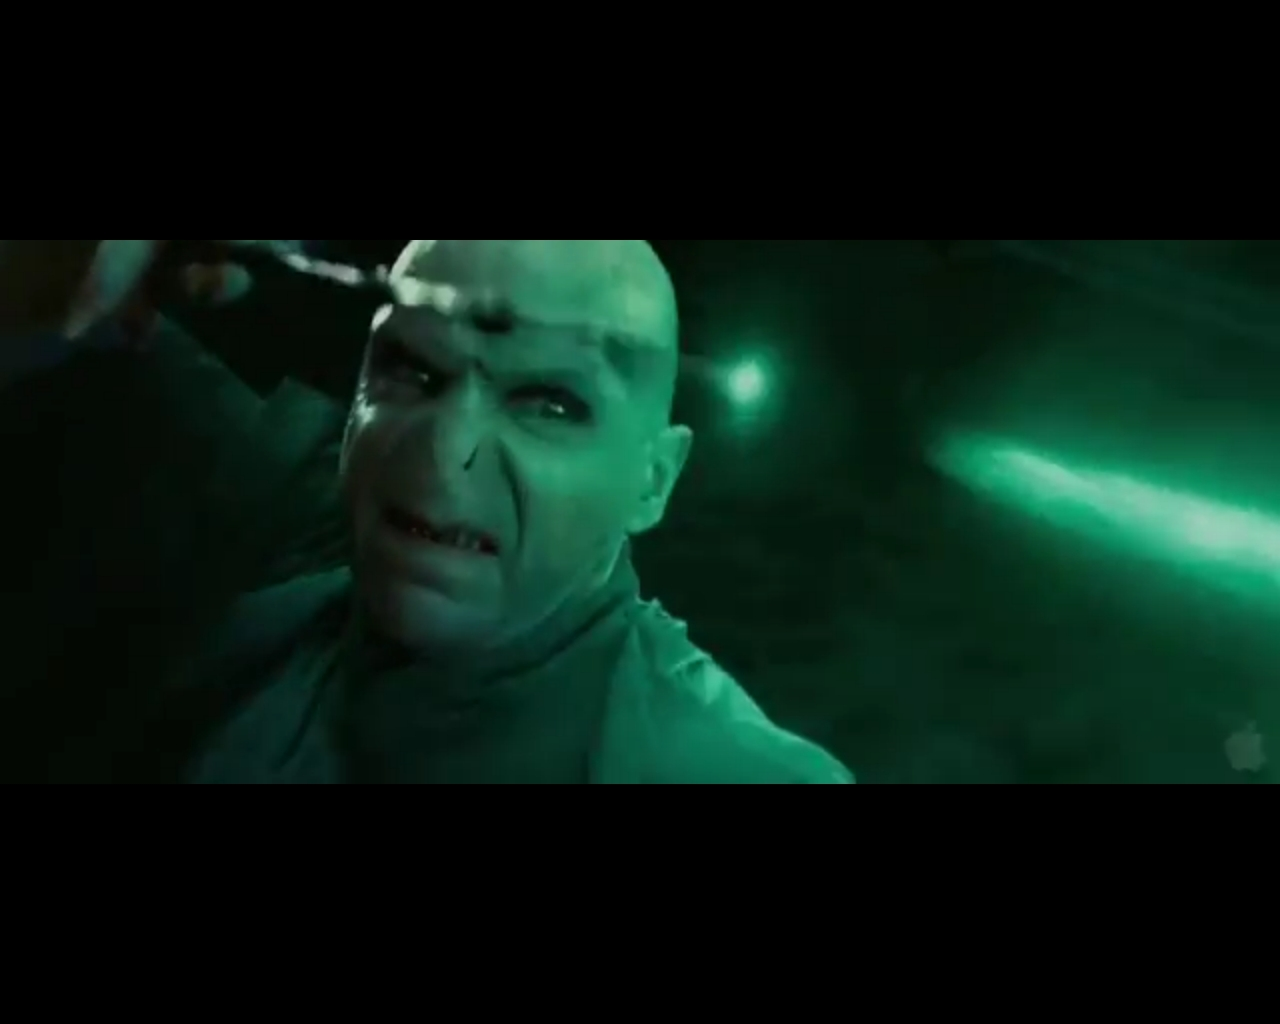 Voldemort duelling harry harry potter photo 22958506 for Harry elder